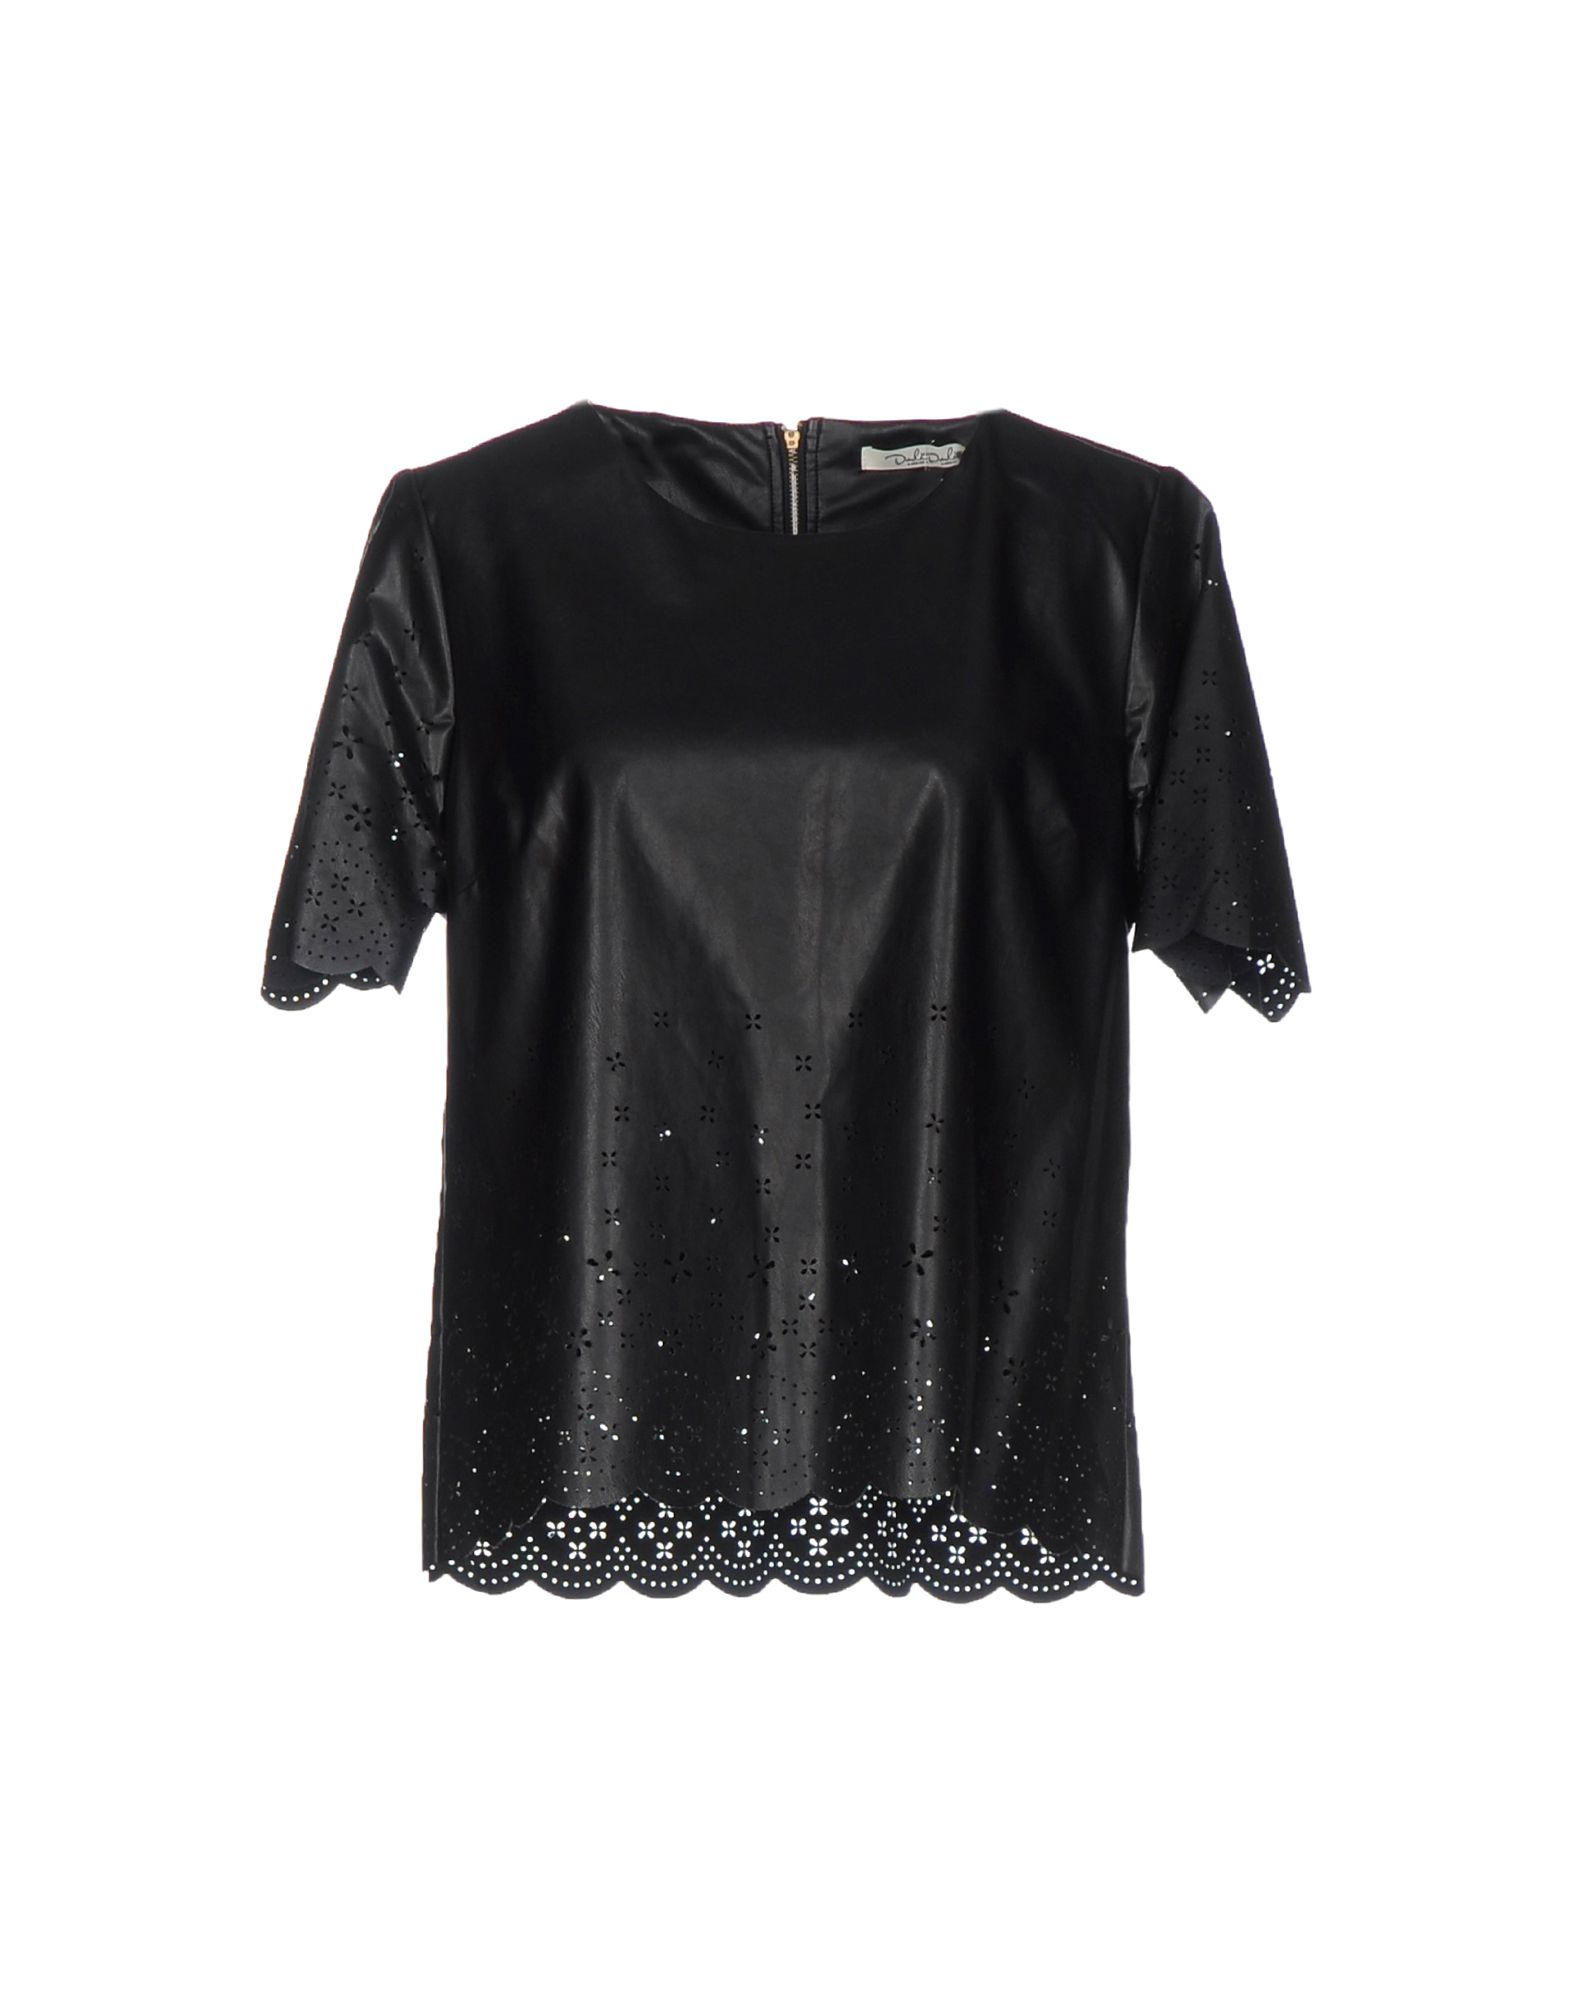 DARLING London Блузка блузка quelle buffalo london 564007